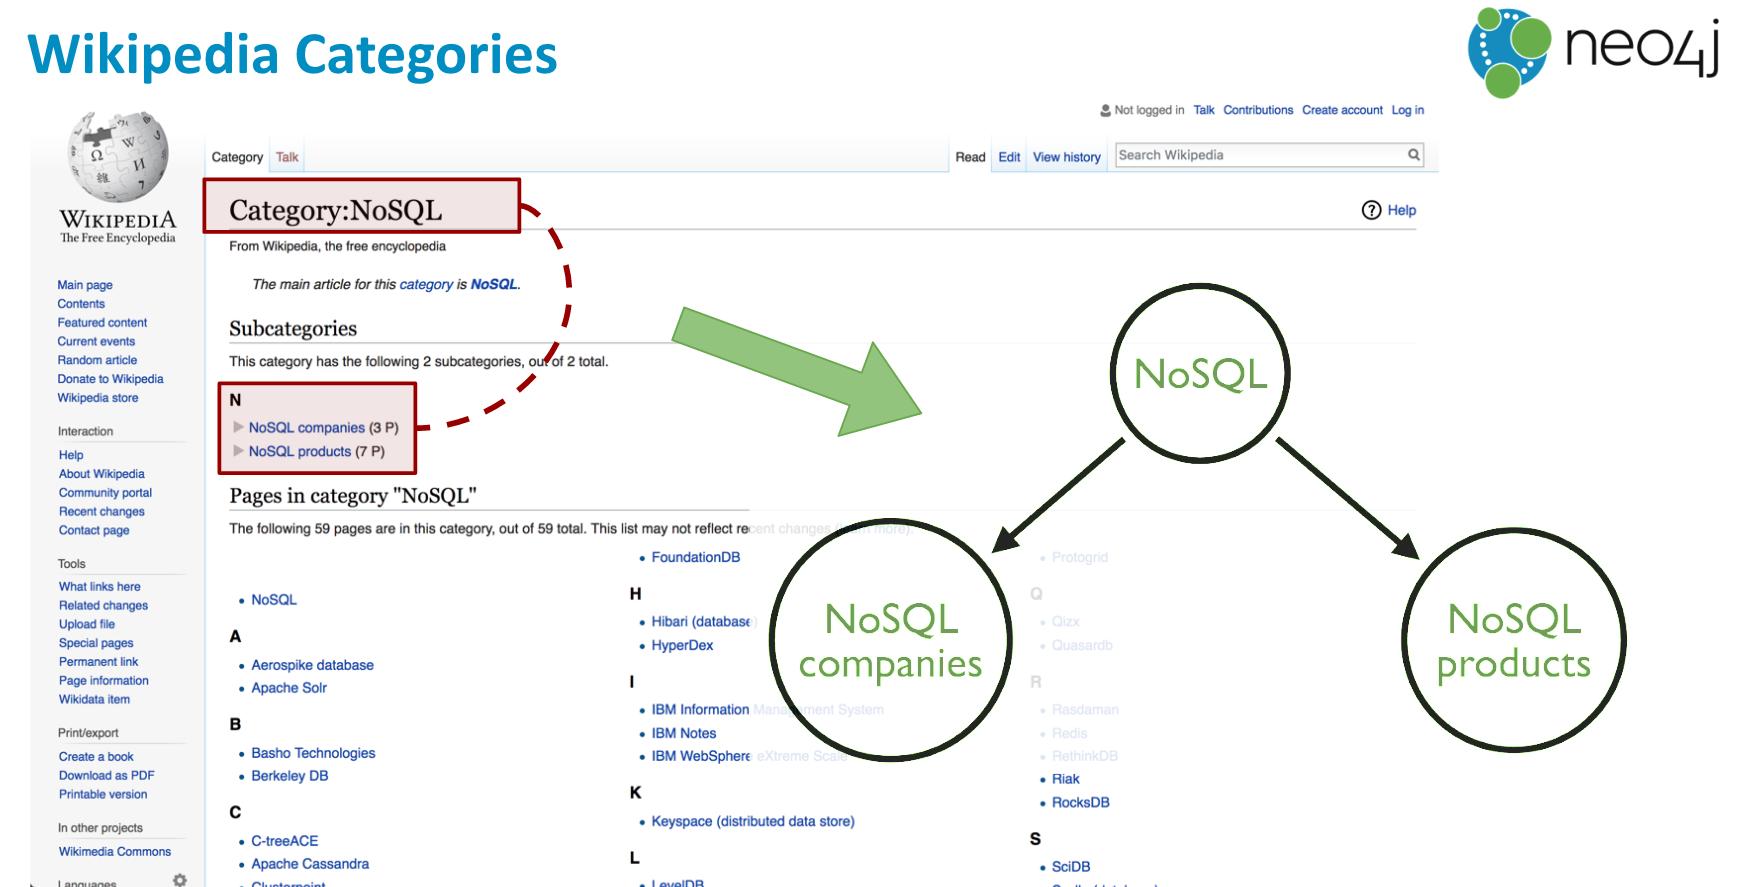 QuickGraph#6 Building the Wikipedia Knowledge Graph in Neo4j